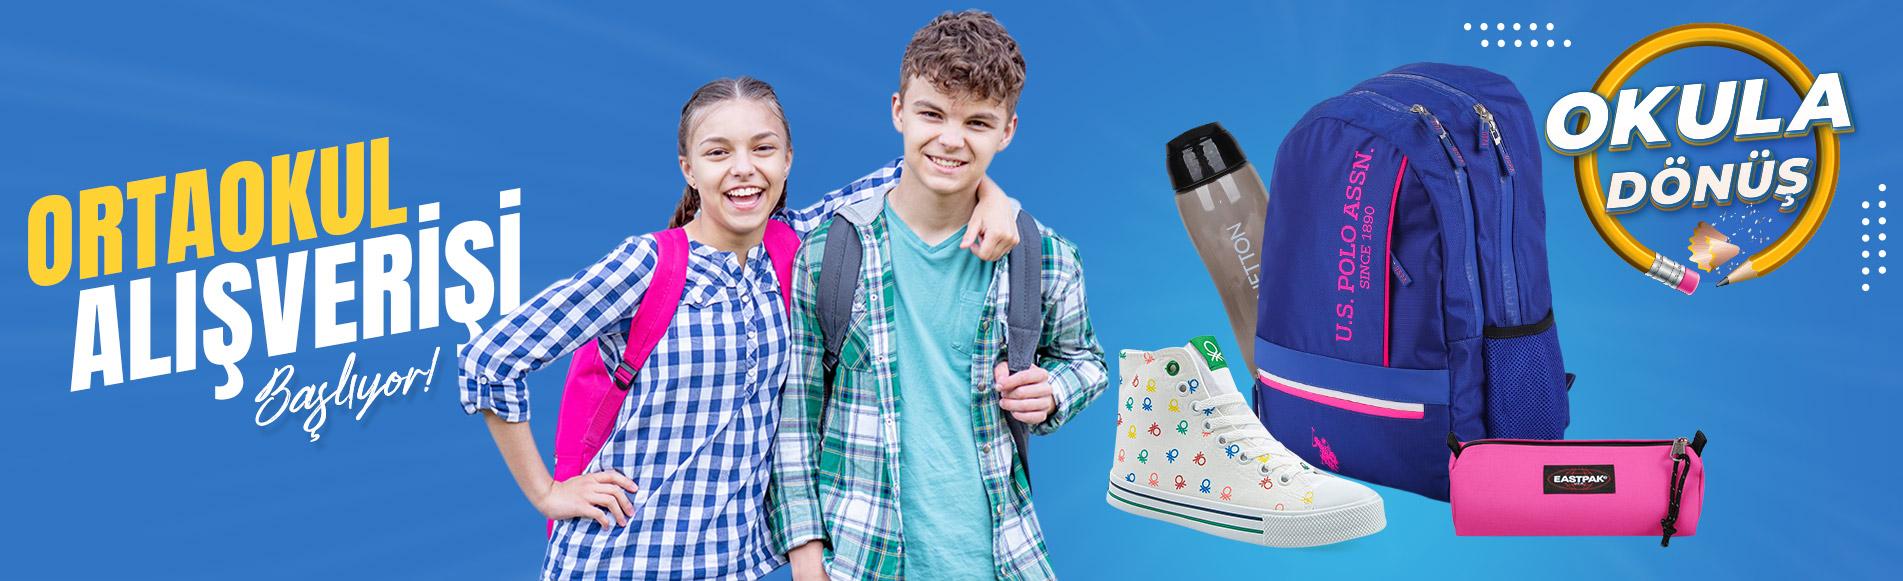 Okula Dönüş - Ortaokul